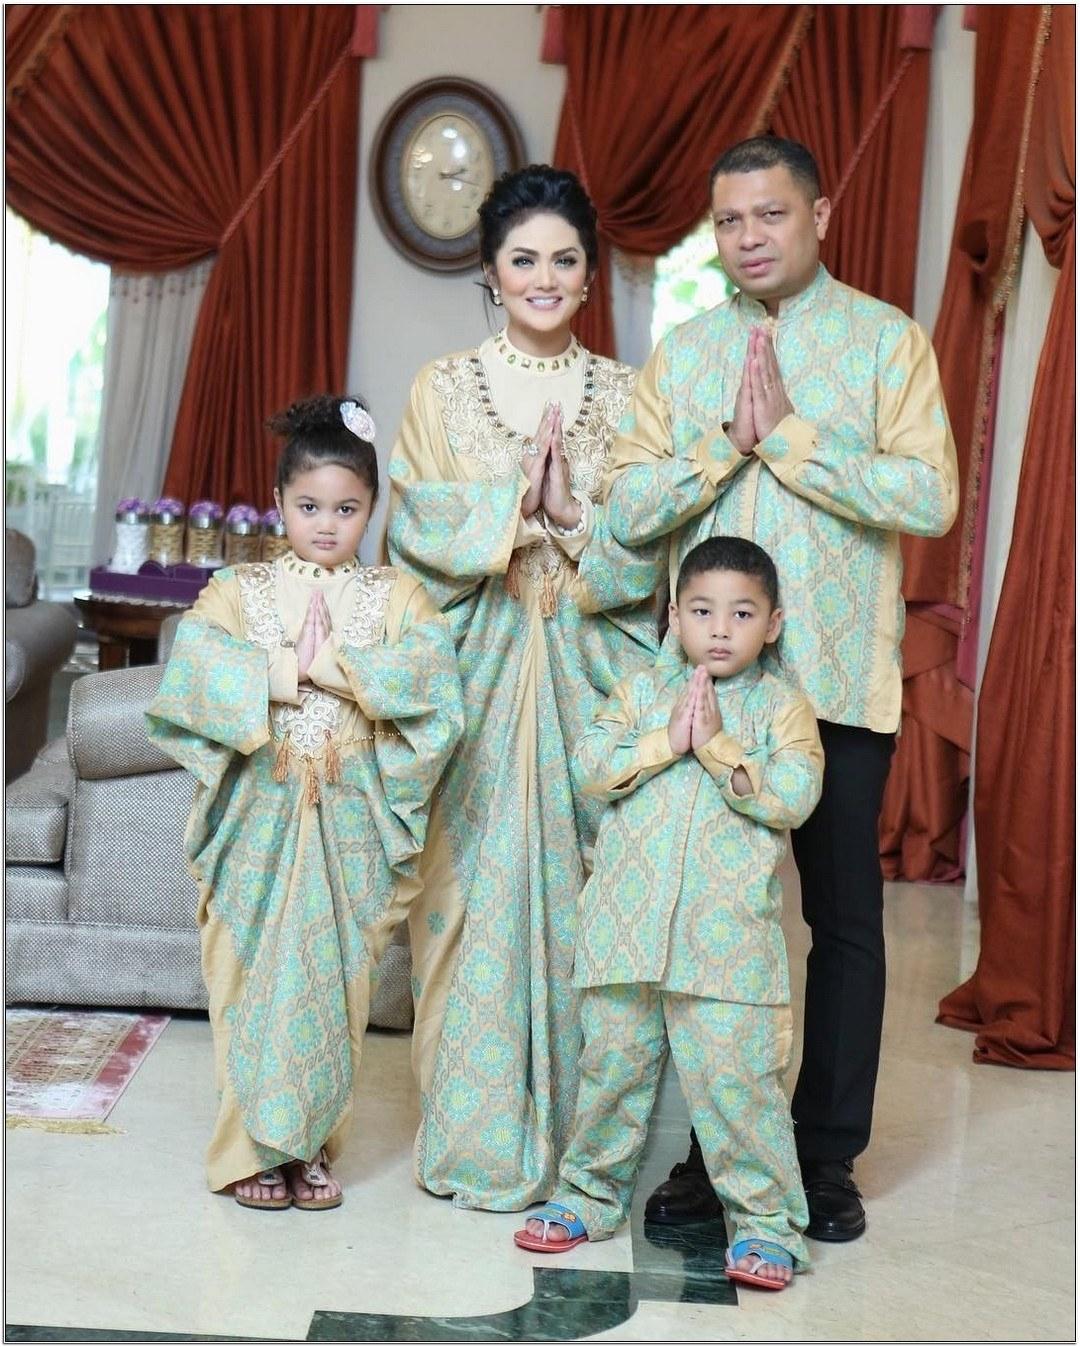 Ide Baju Lebaran Keluarga Artis E9dx Model Baju Seragam Lebaran Artis